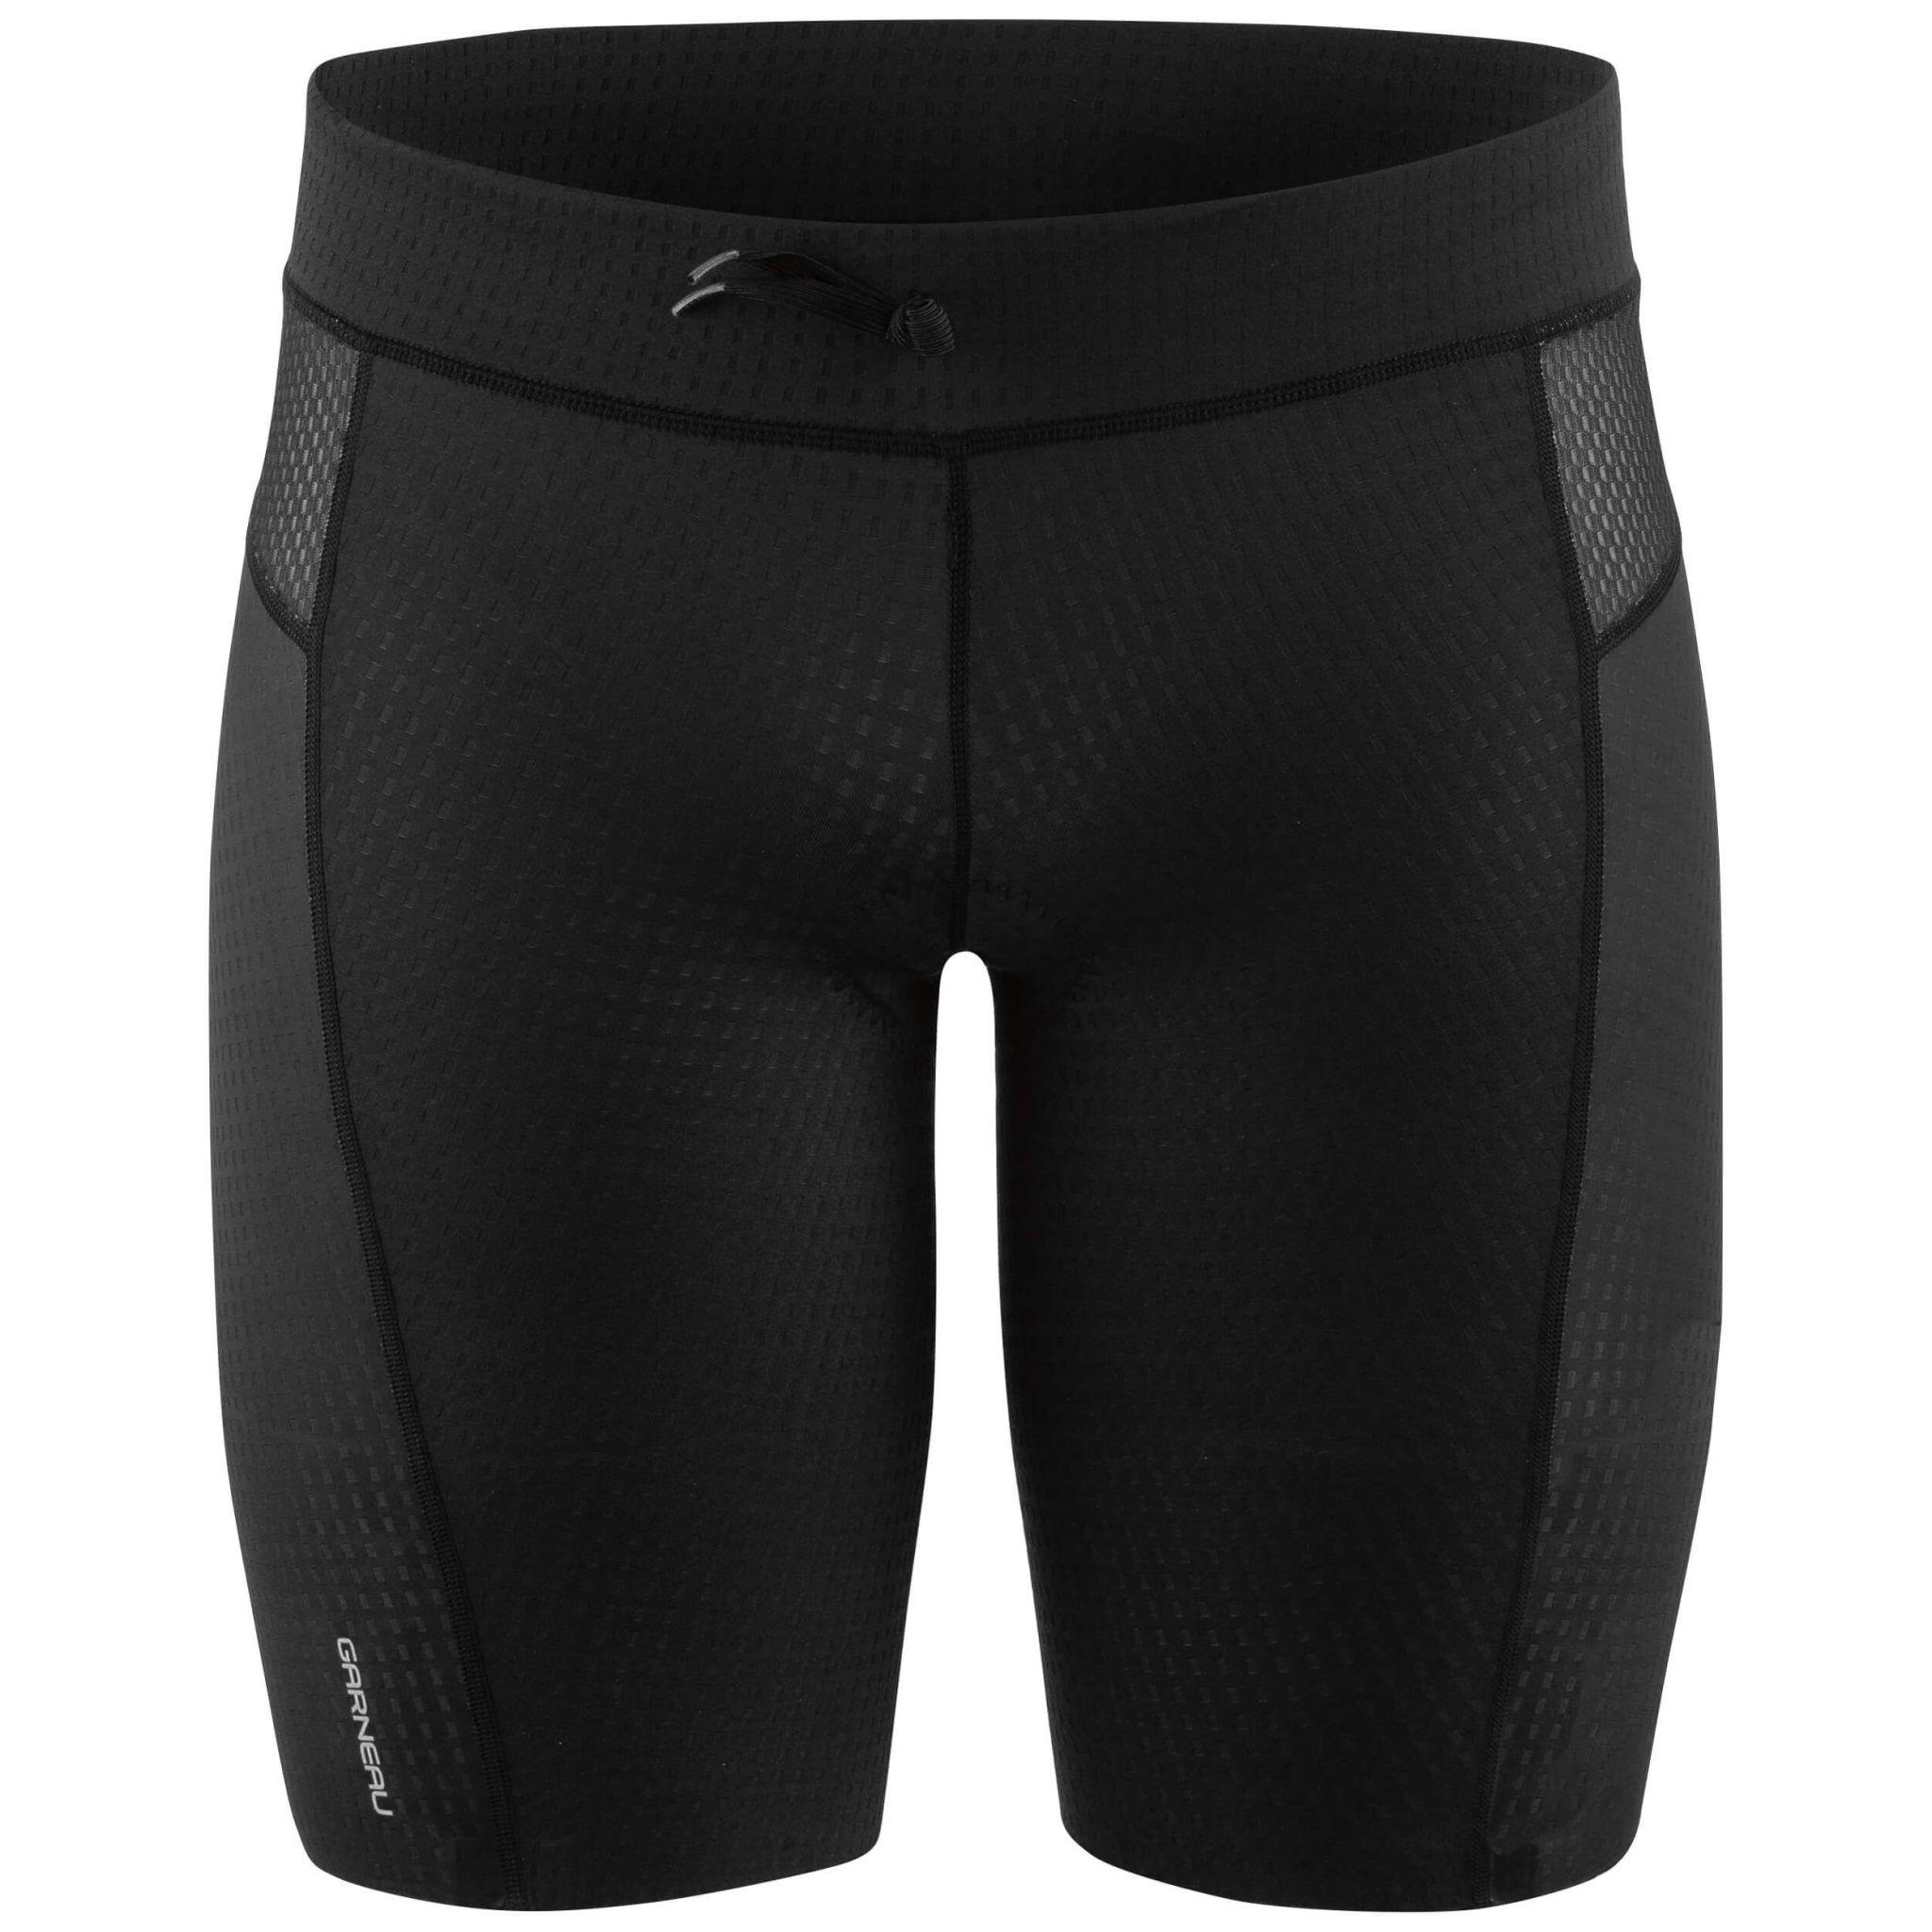 Louis Garneau Men's Vent Tri Shorts